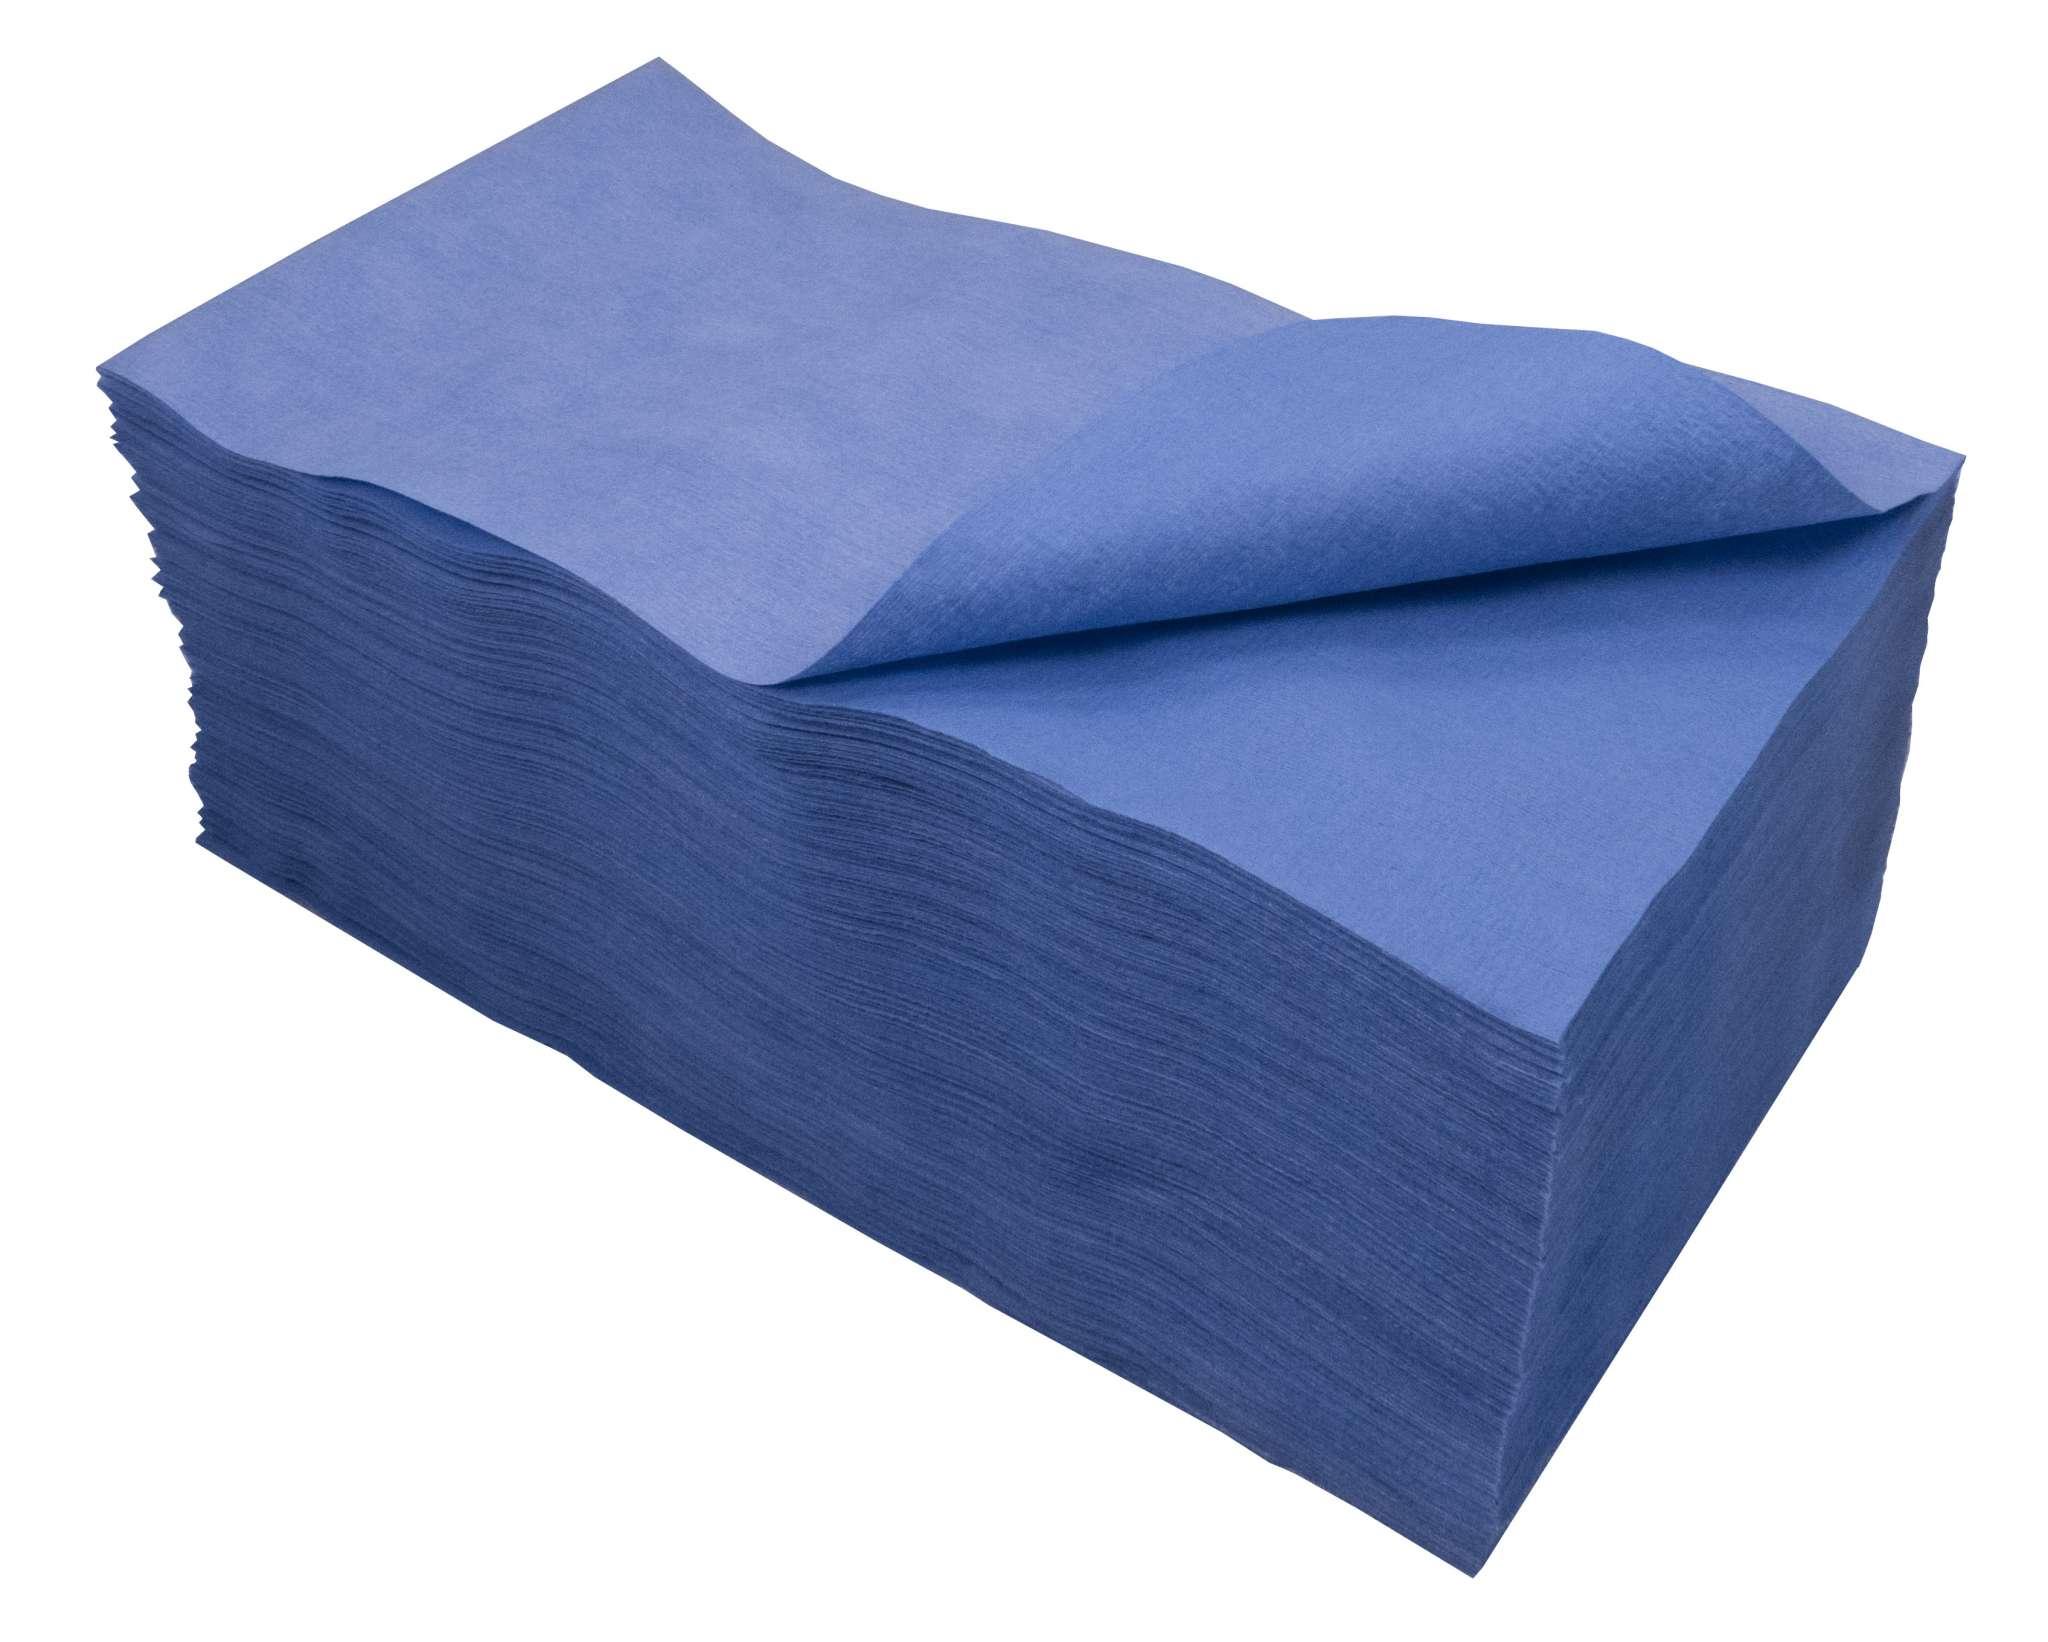 #08321 Sontex™ Wipe 1/4 Fold Bulk